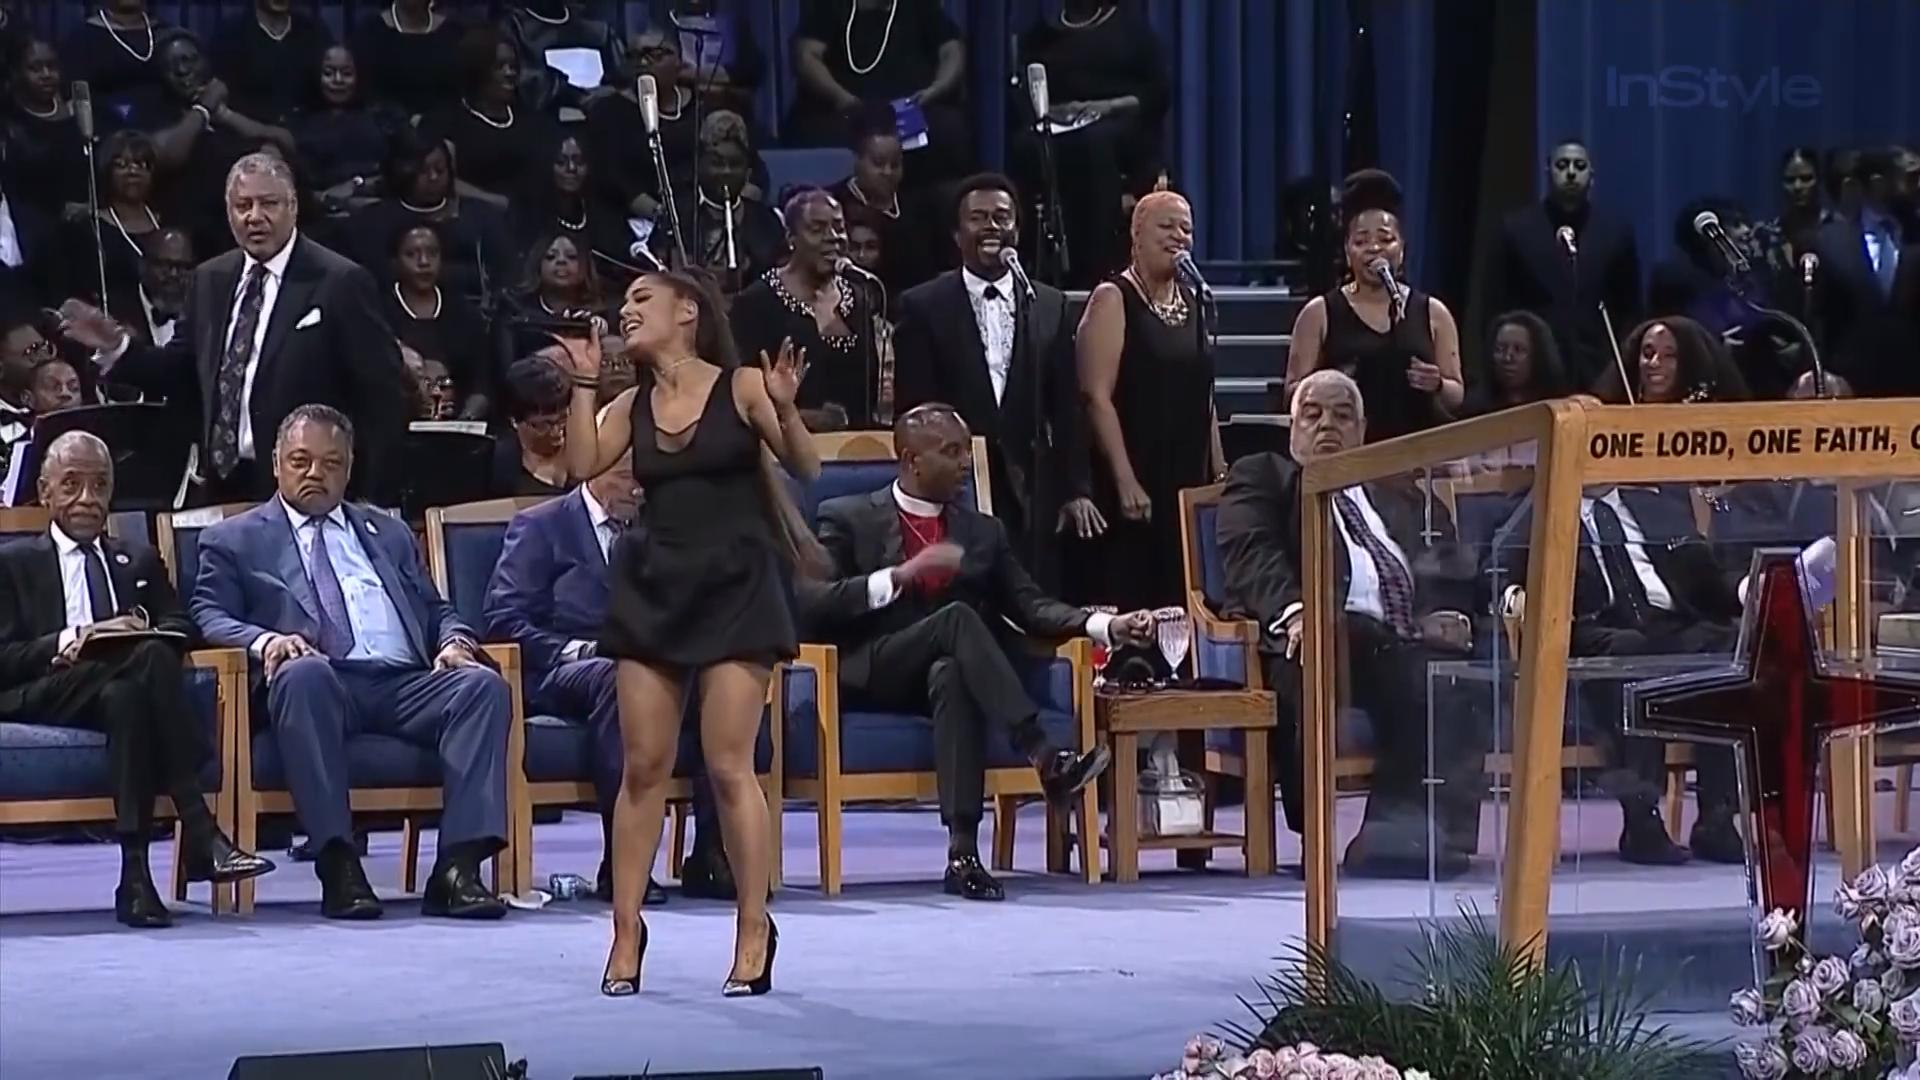 The Internet Slut-Shames Ariana Grande for Minidress at Aretha Franklin's Funeral